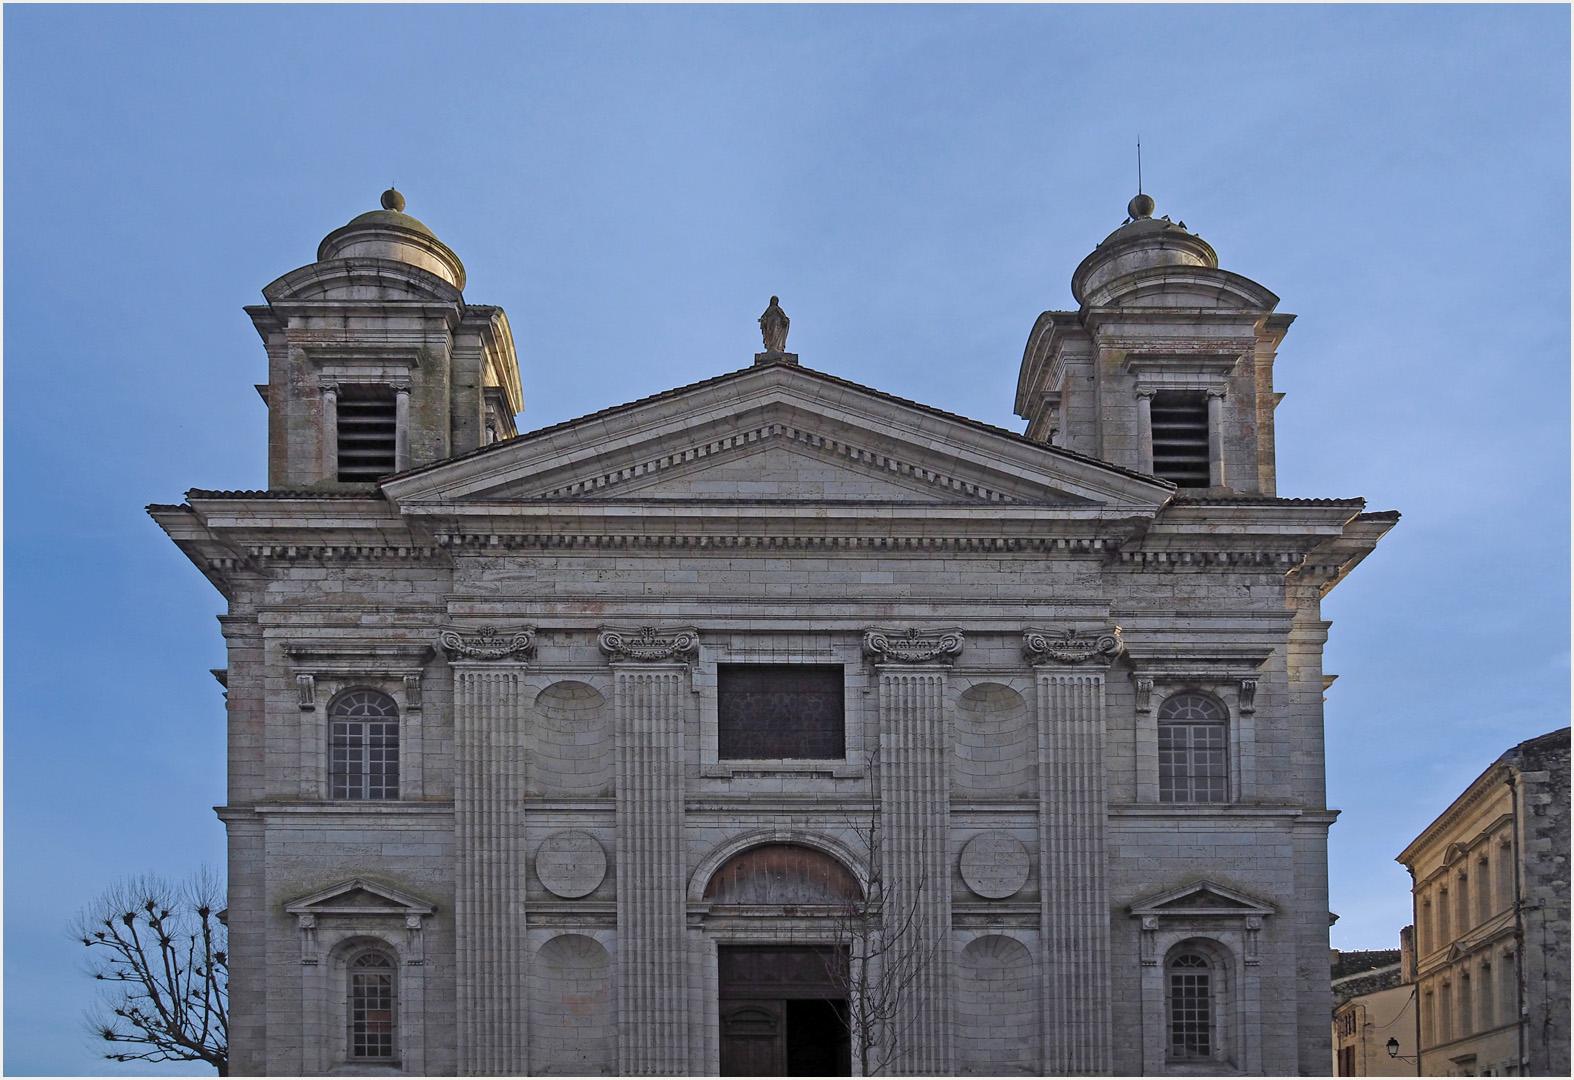 Façade de l'Eglise Saint-Nicolas de Nérac (XVIIIème)